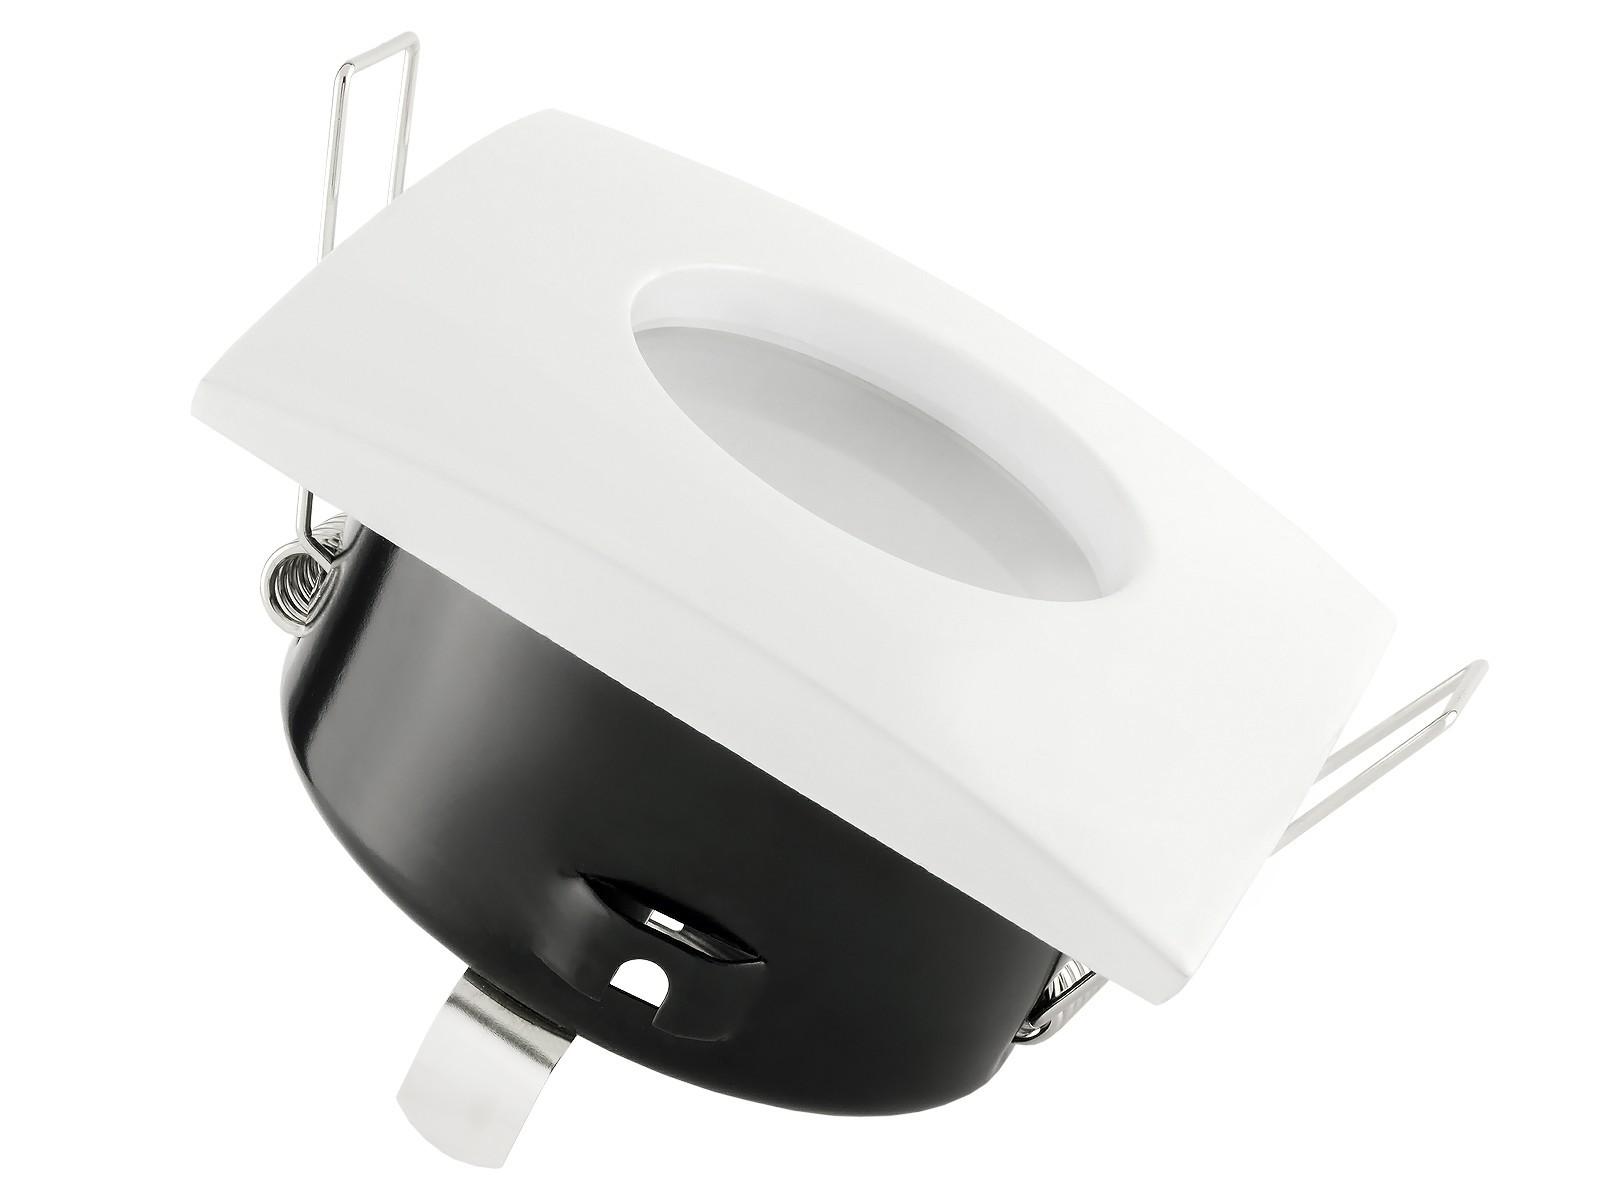 qw 1 led einbaustrahler weiss bad dusche feuchtraum ip65 4 3w warmwei dimmbar gu10 master. Black Bedroom Furniture Sets. Home Design Ideas